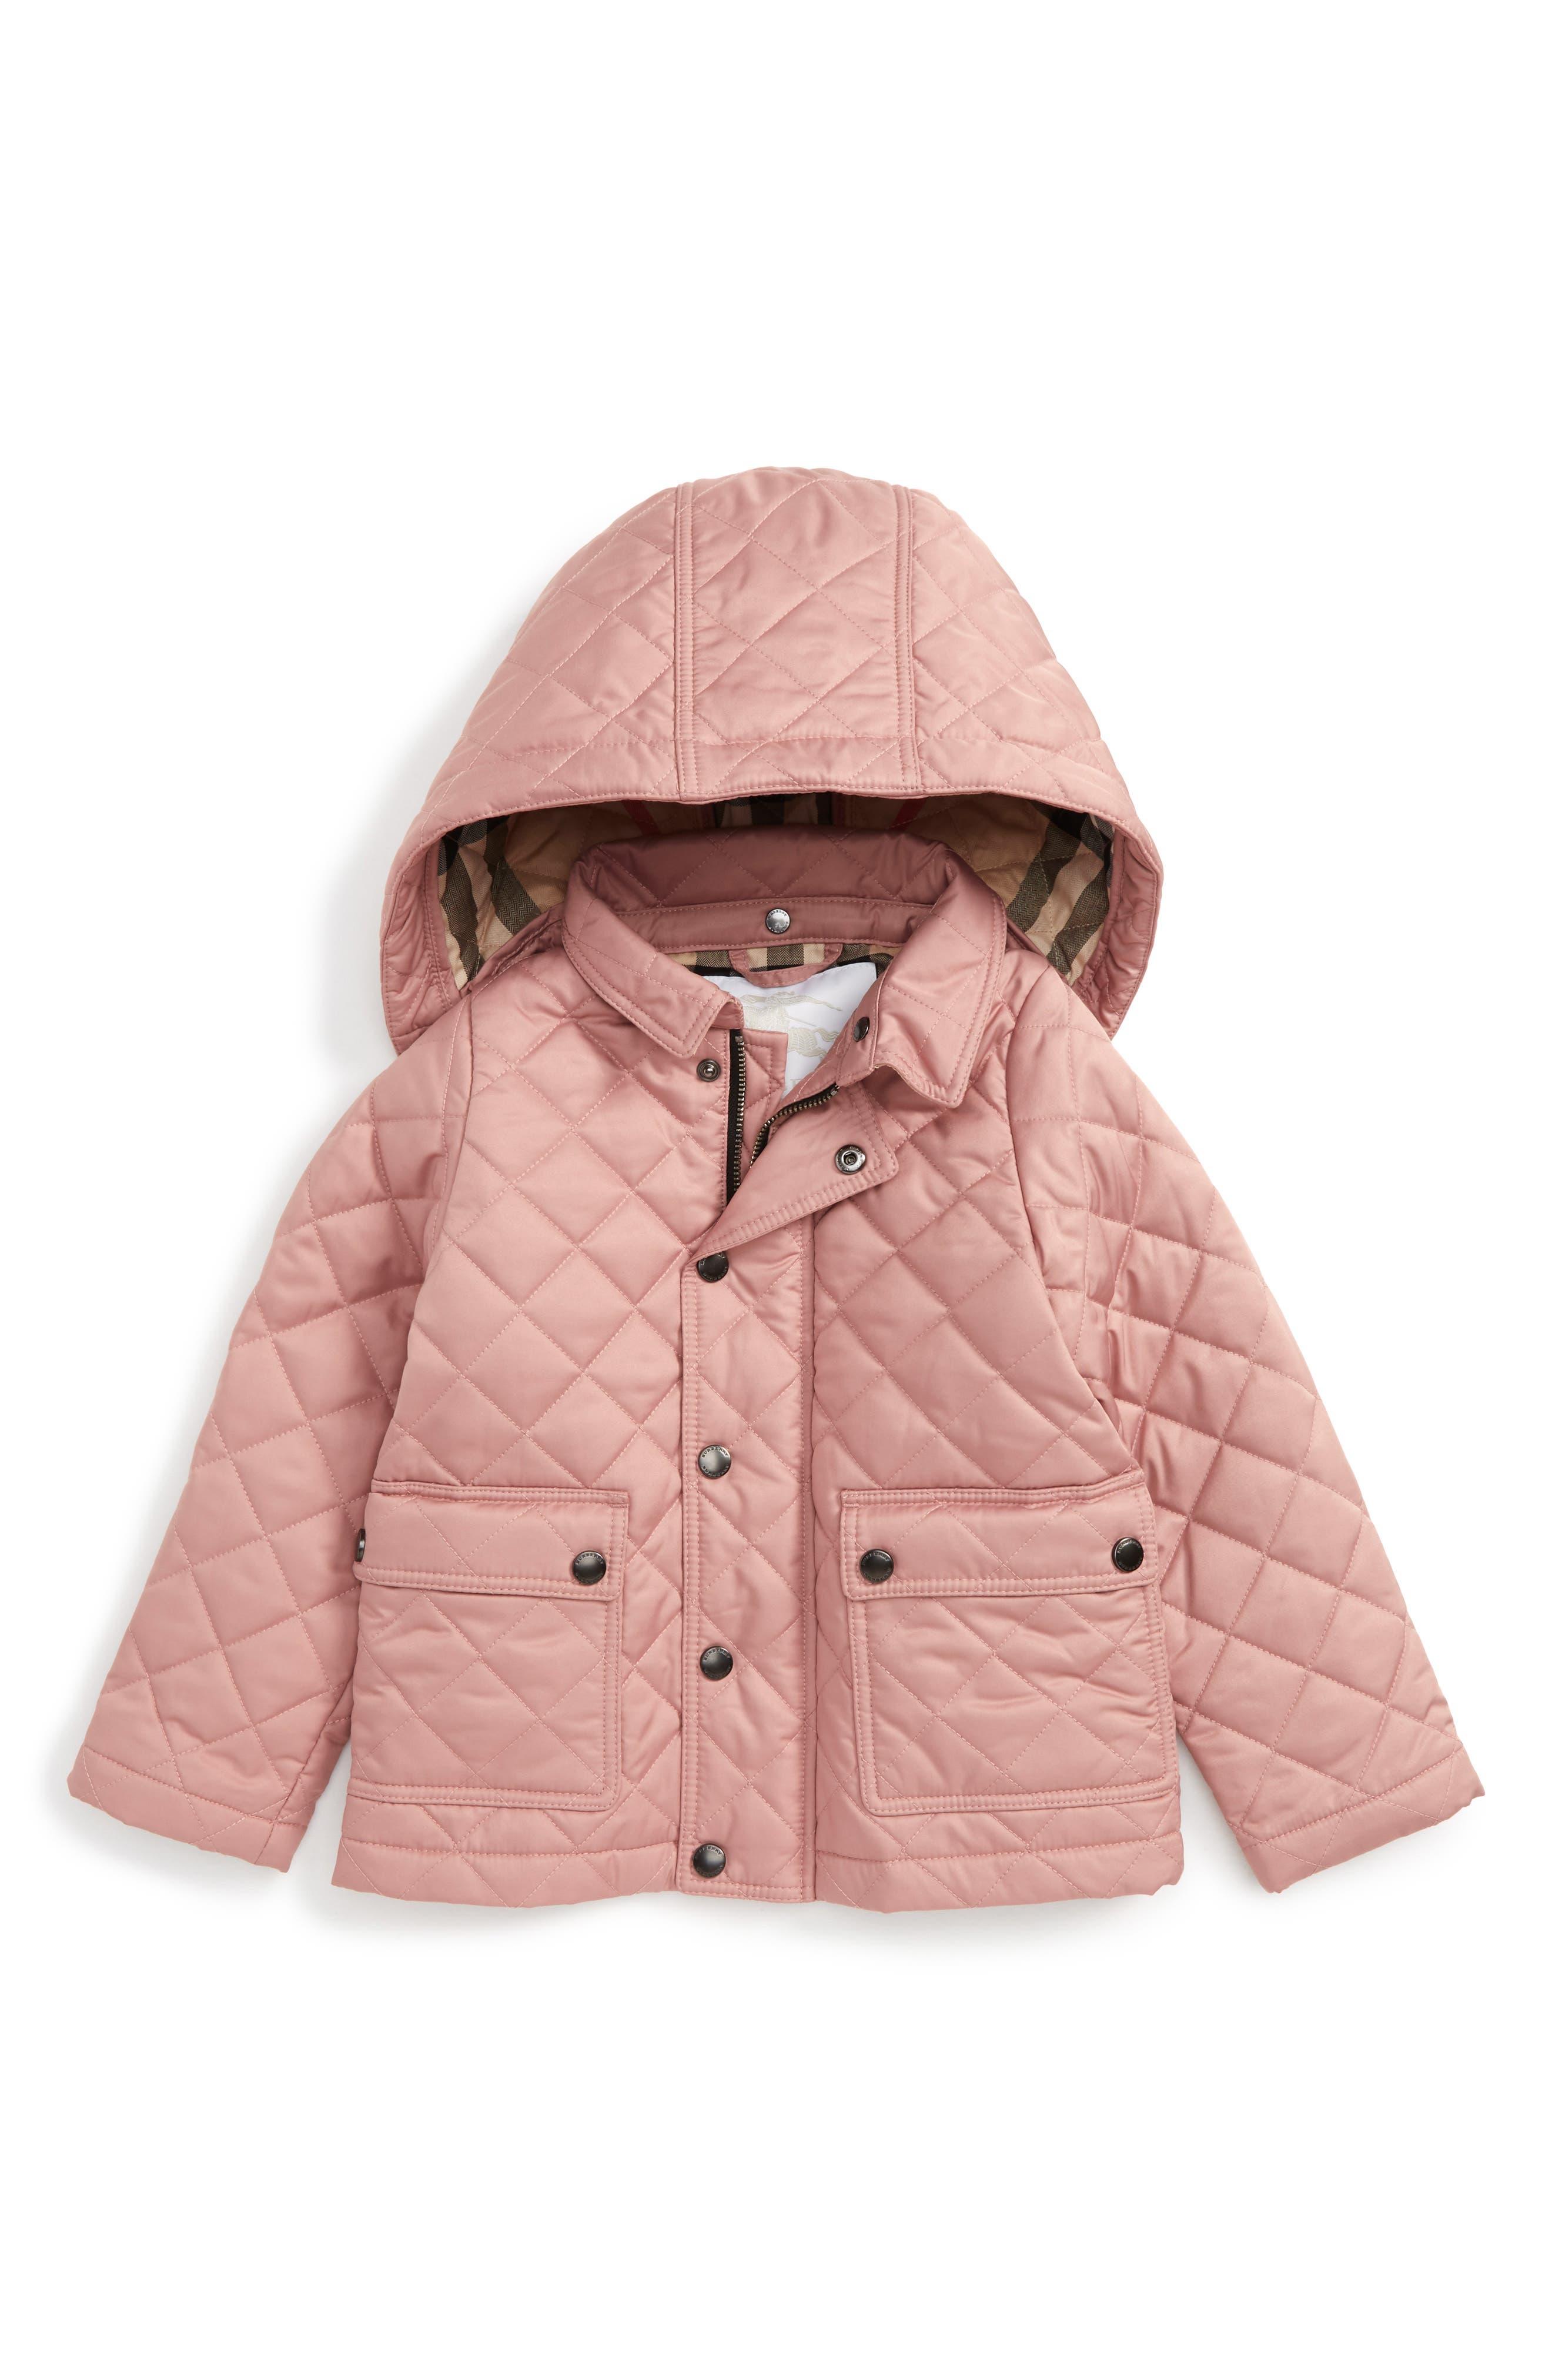 London Fog Baby Girls Puffer Jacket